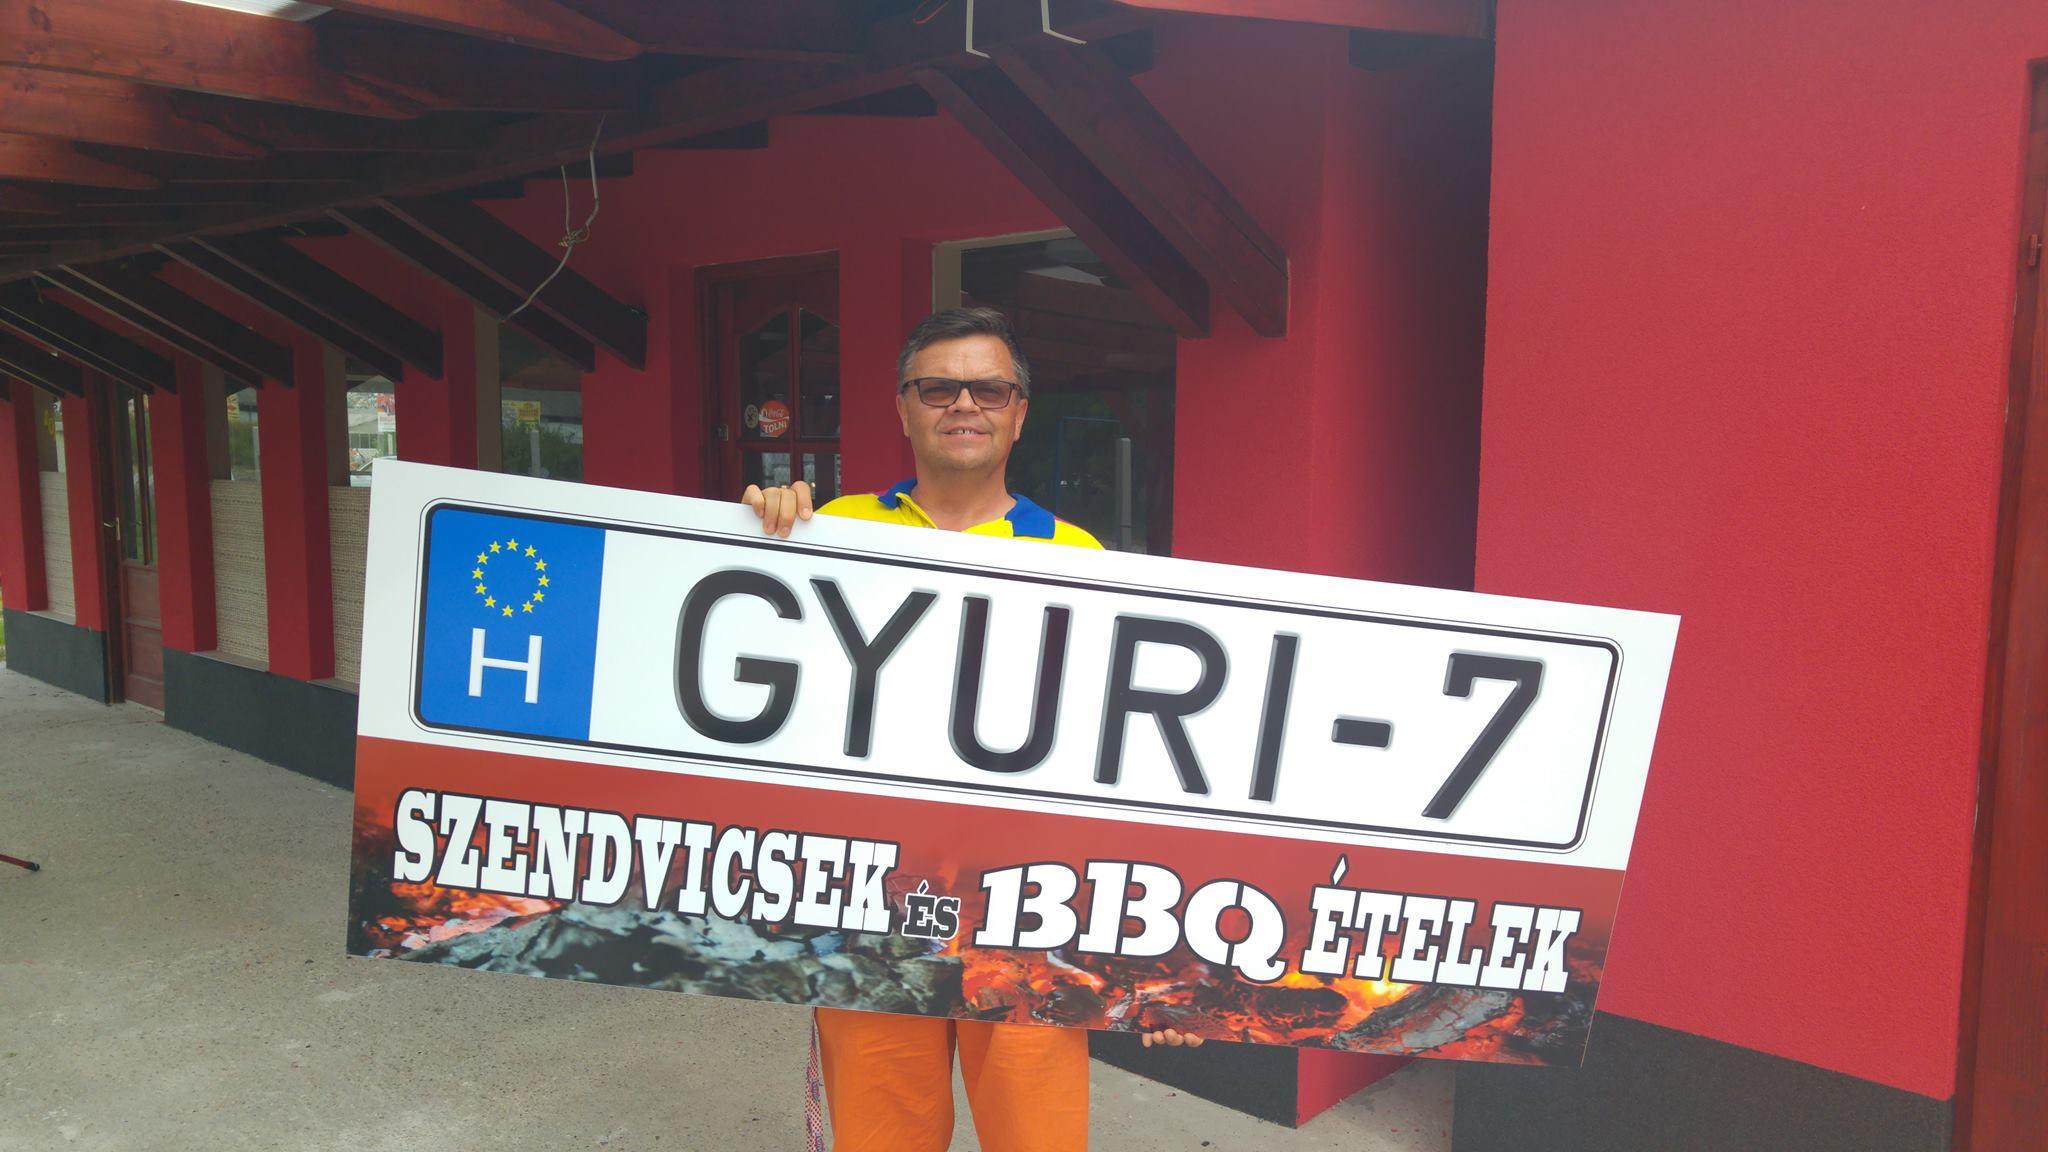 gyuri-7 bbq étterem szigethalom okosgrill